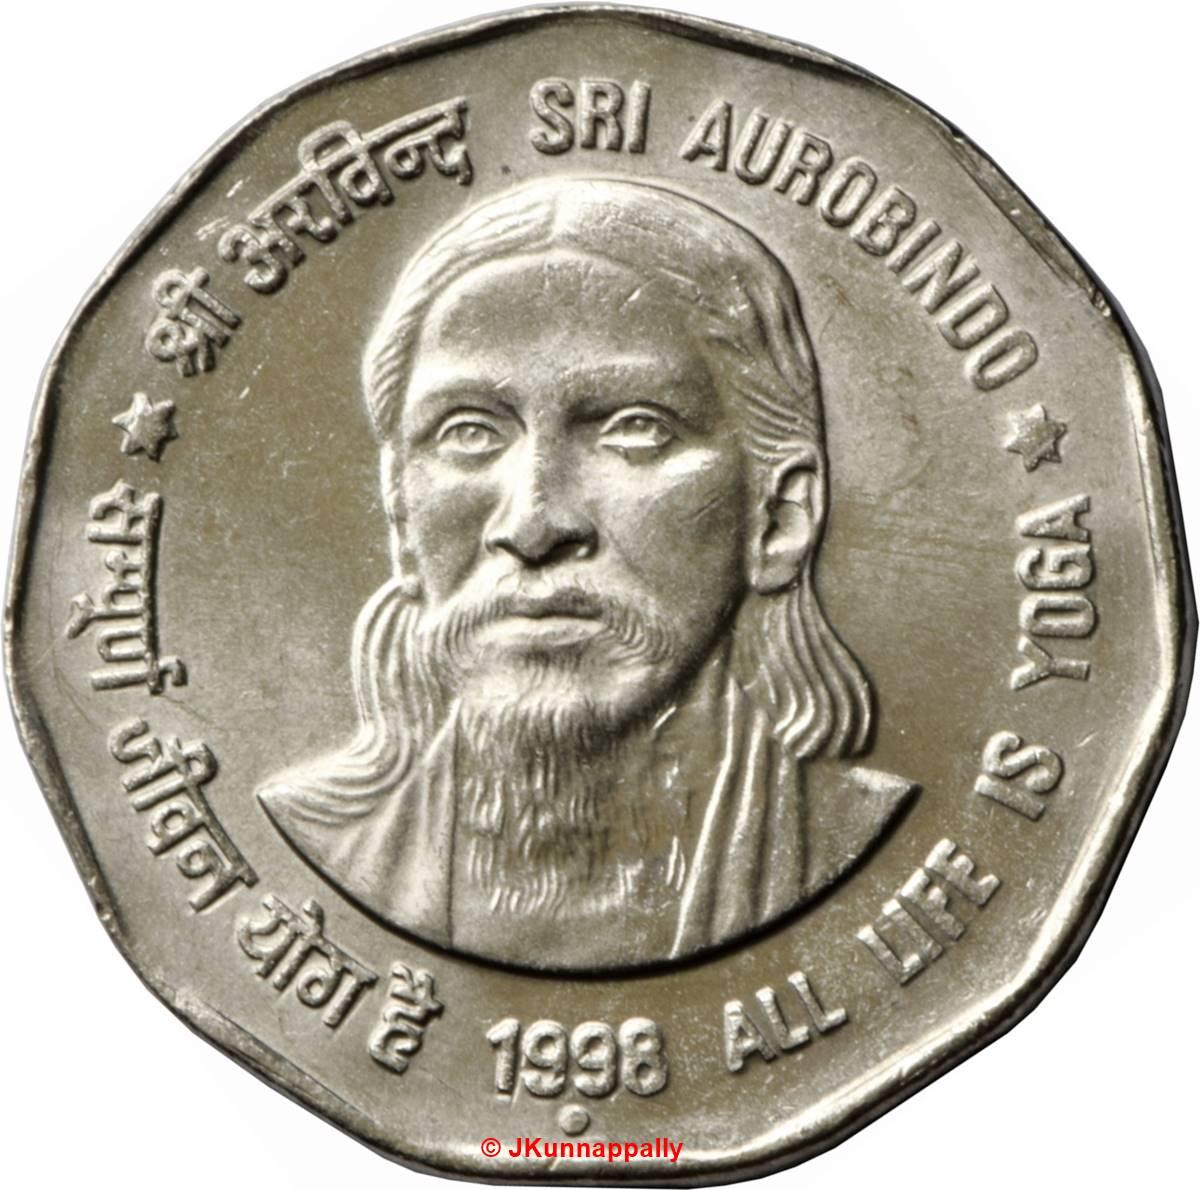 Sri Aurobindo coin